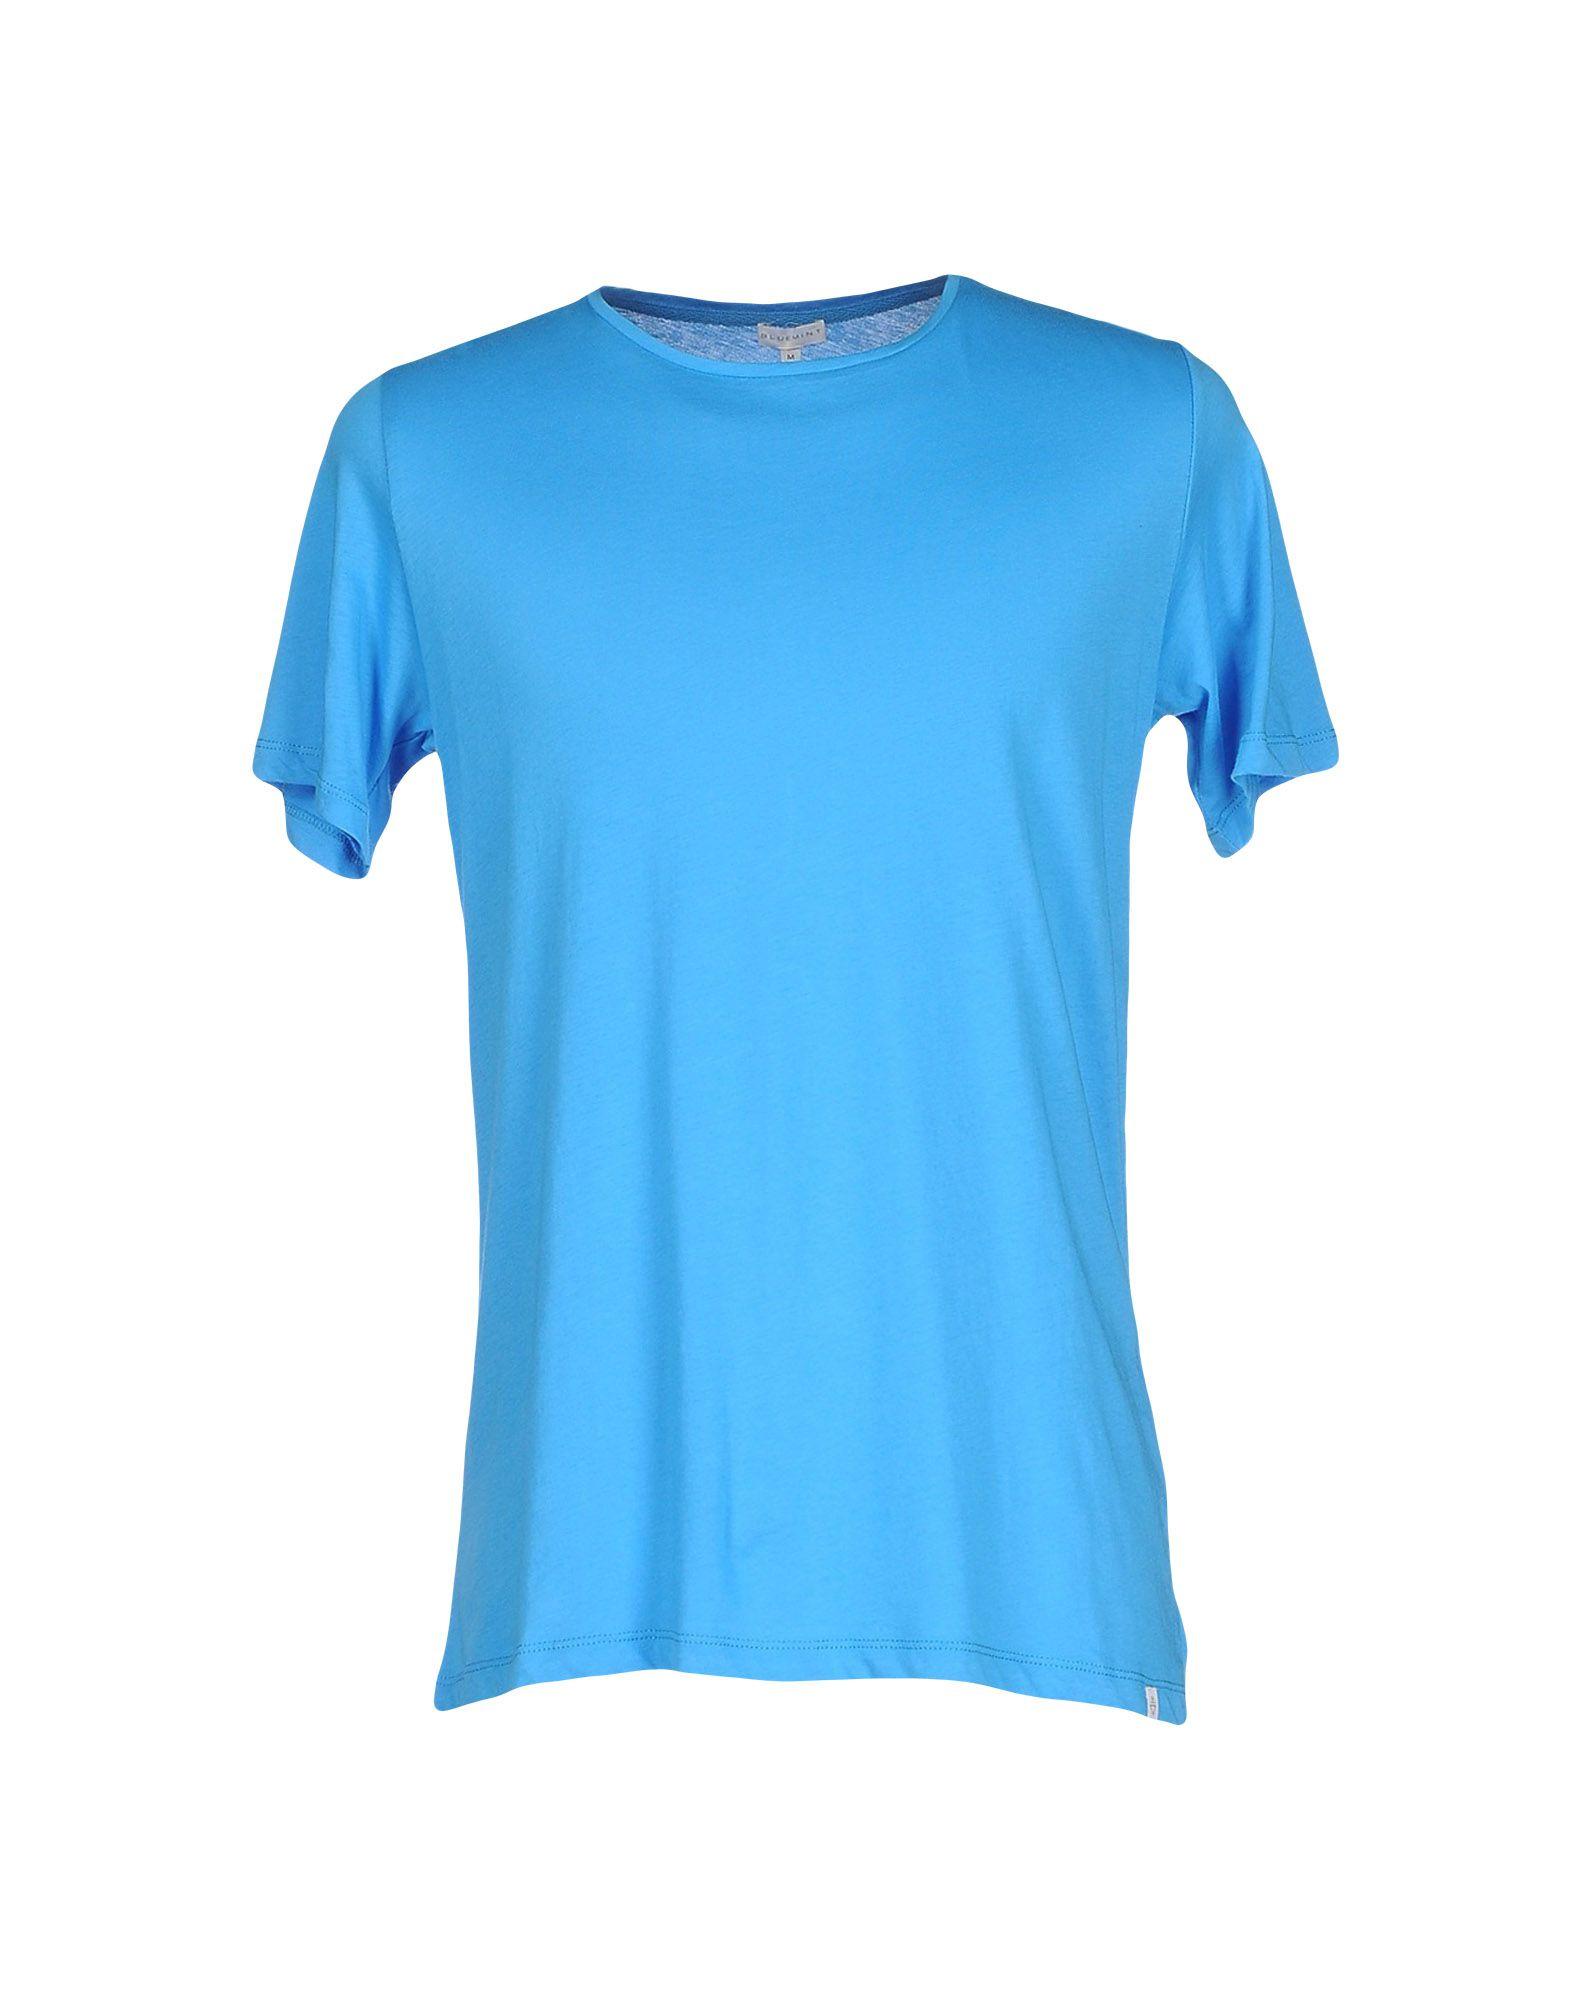 BLUEMINT T-Shirt in Azure